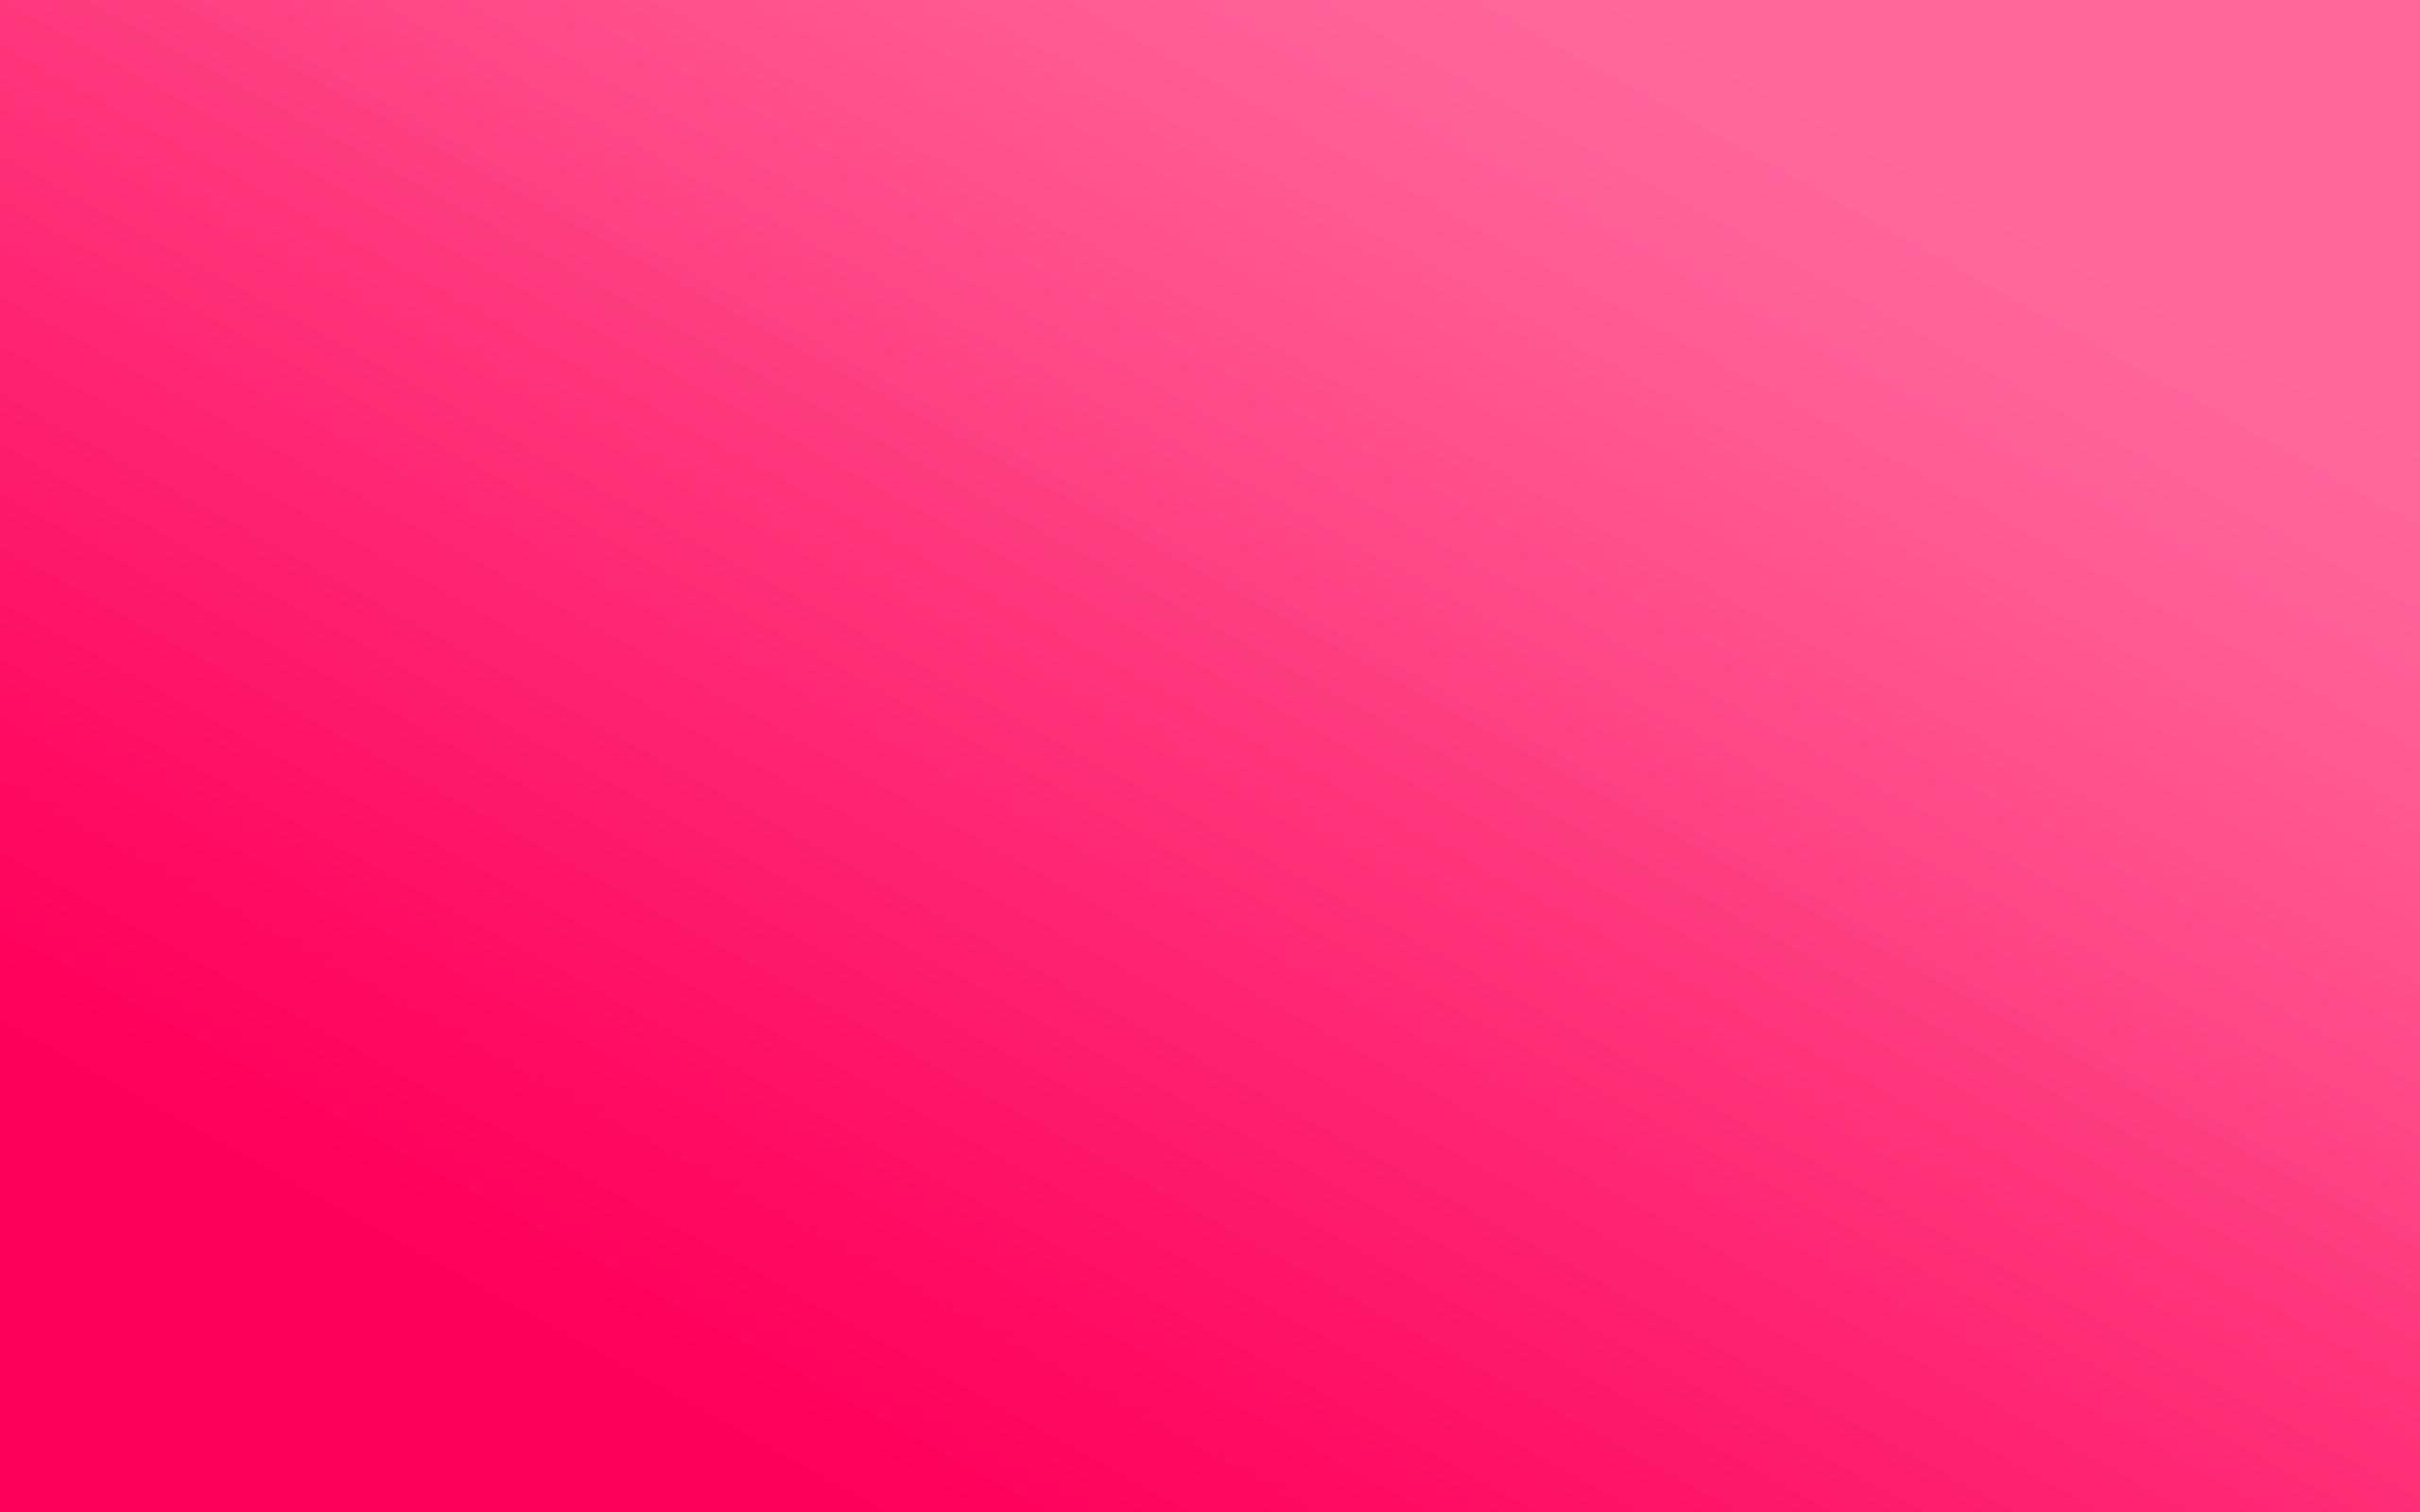 Pink Solid Color Wallpaper